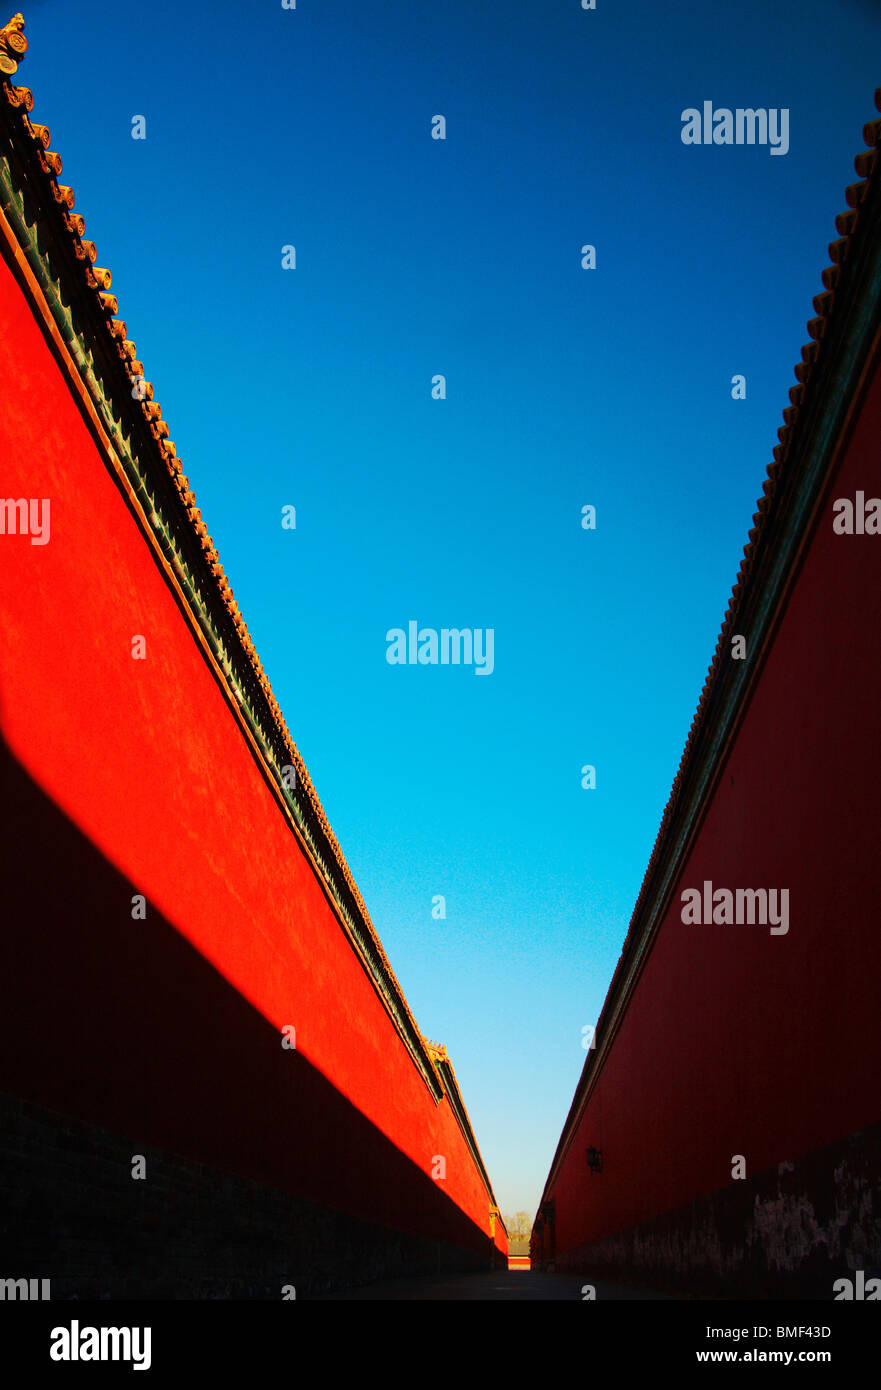 Rote Palast Mauer der verbotenen Stadt, Peking, China Stockfoto